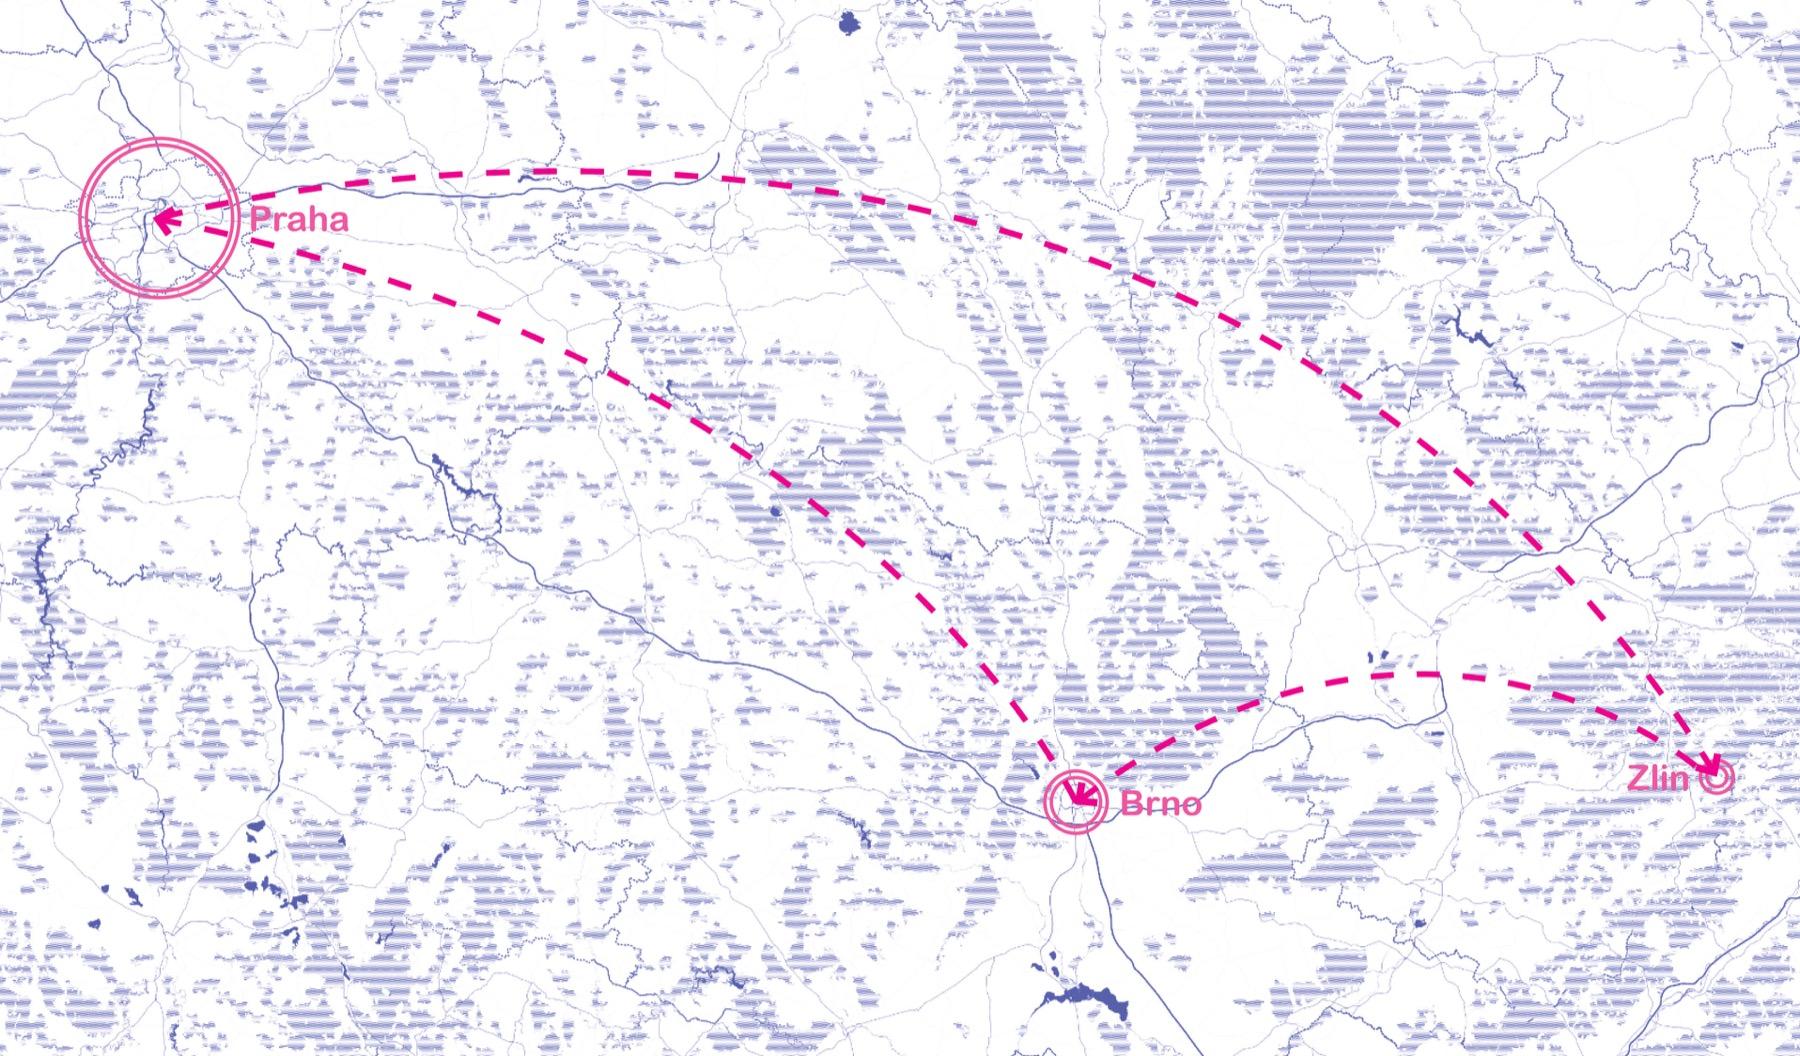 map of trip_resized_07:25:2019.jpg